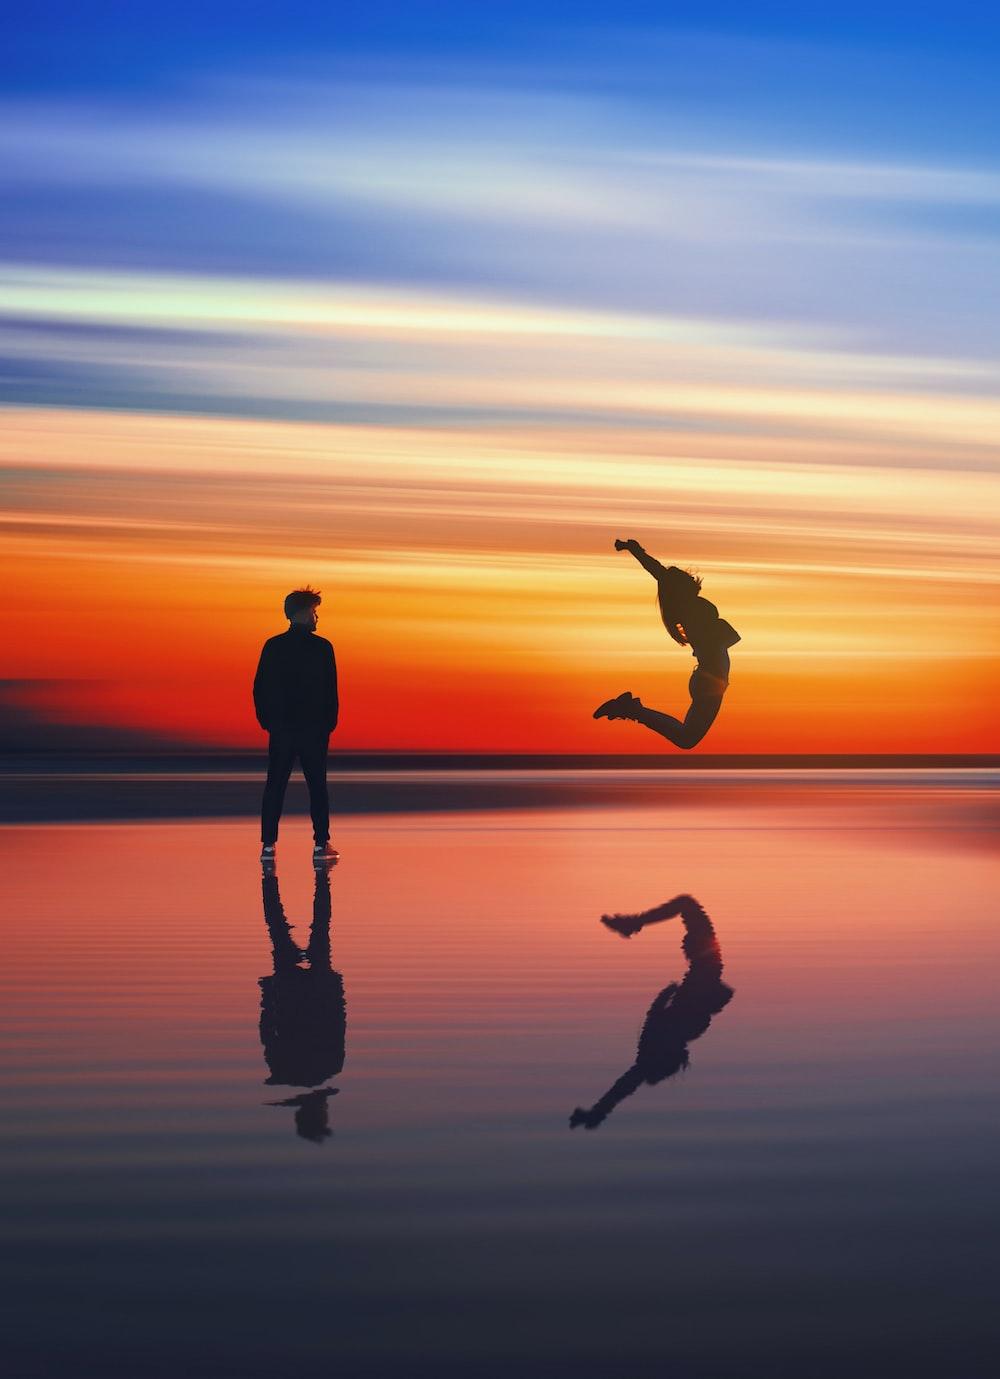 man near woman jumping near body of water